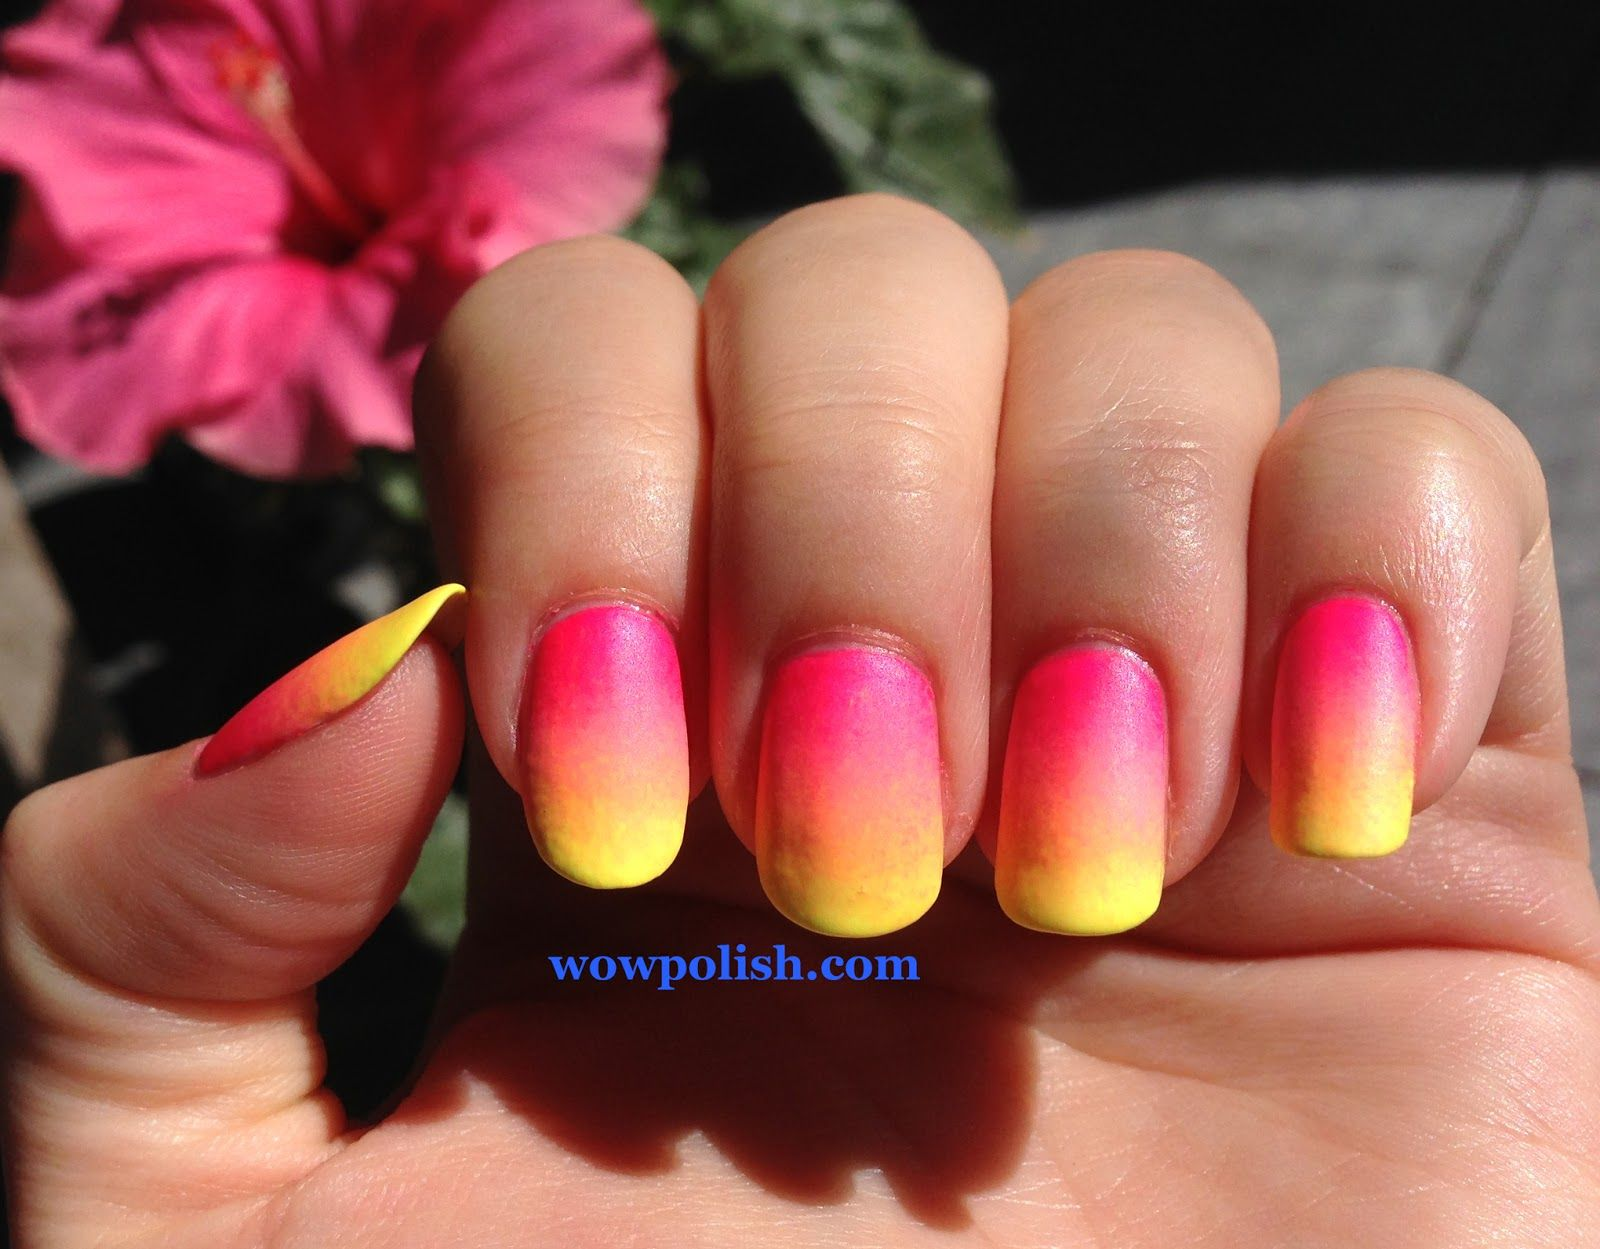 Bright Neon Gradient Nail Art: Pink to Yellow | Nail stuff ...